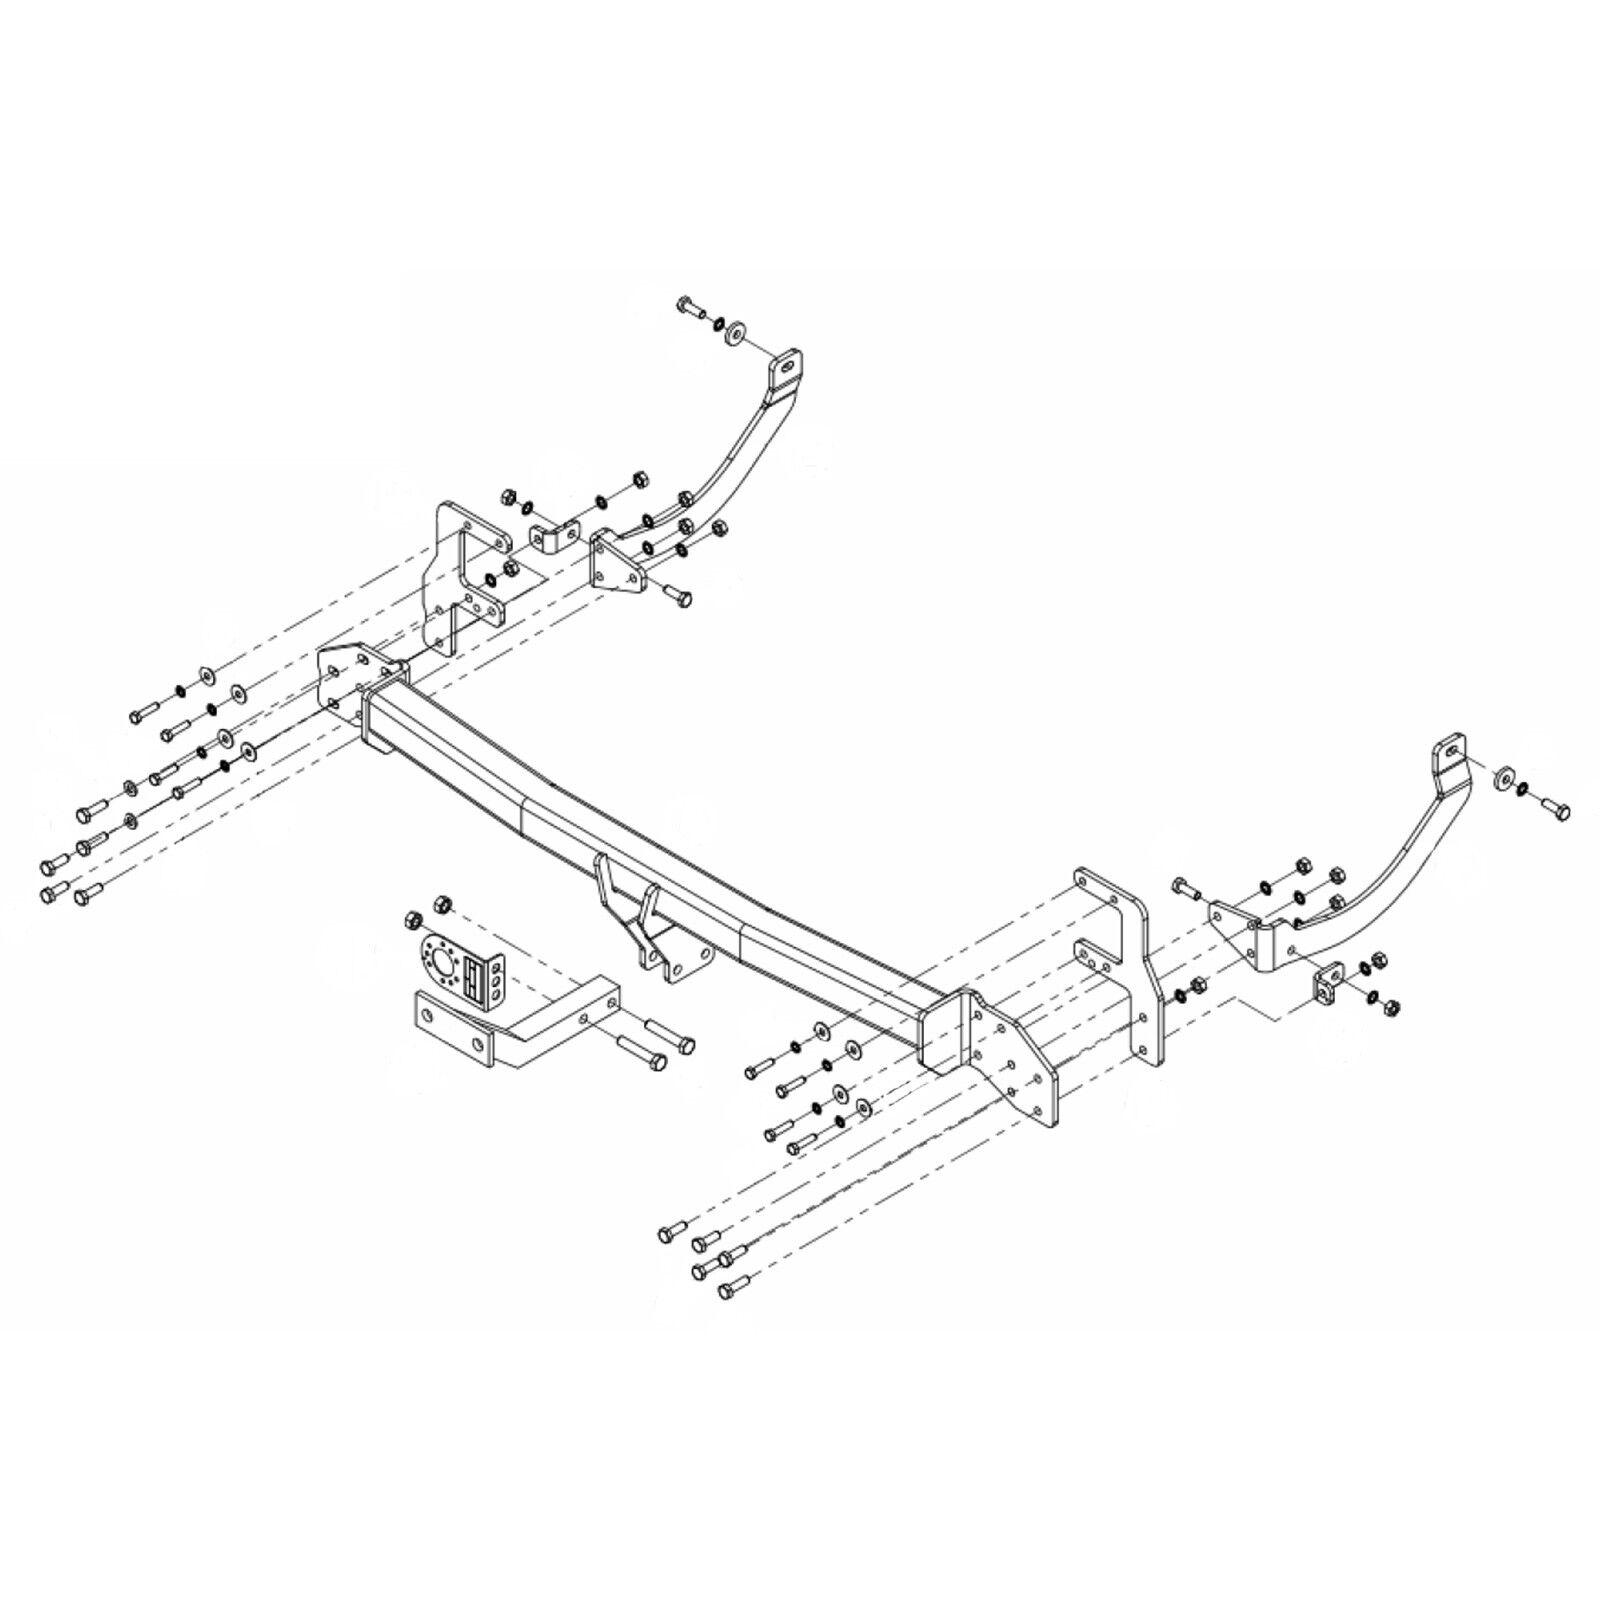 Peugeotcar Wiring Diagram Page 4